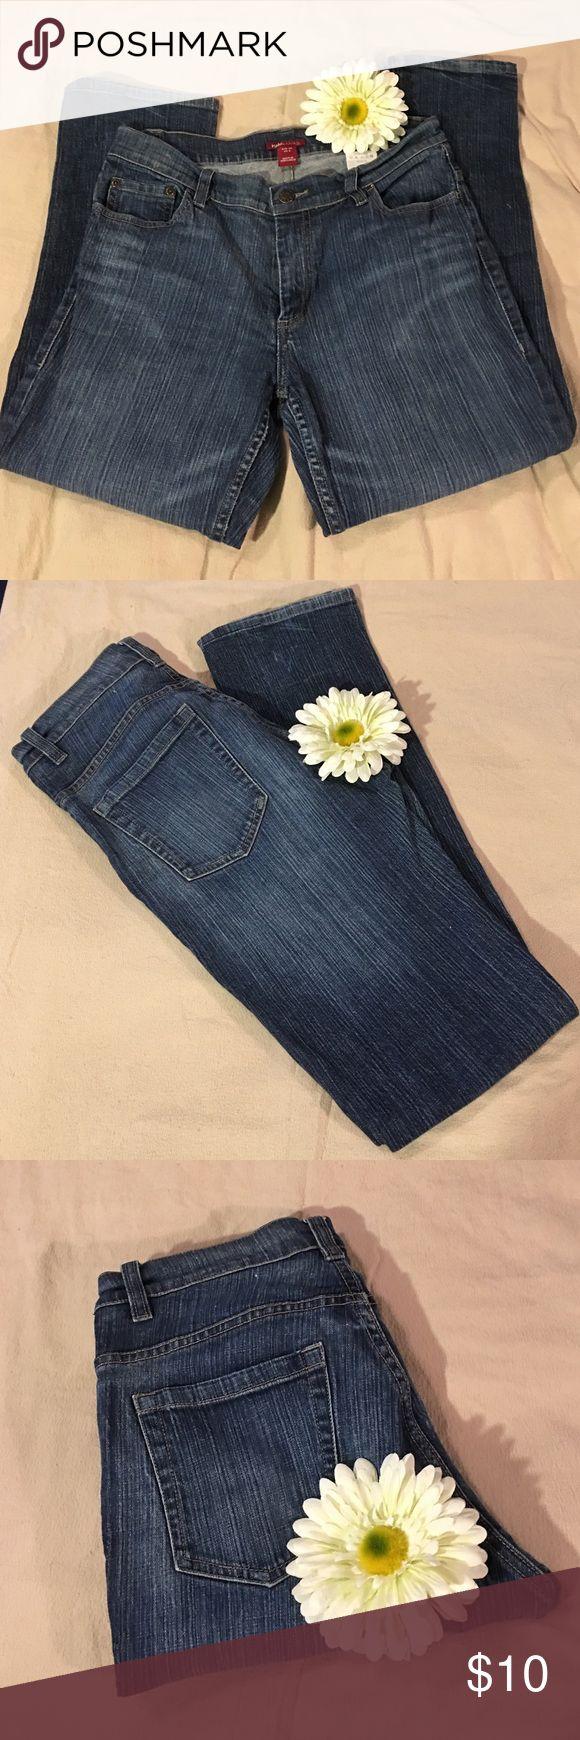 Straight Leg Stretch Jeans Size 8 Straight Leg Stretch Jeans Regular Length Size 8 H&M Jeans Straight Leg